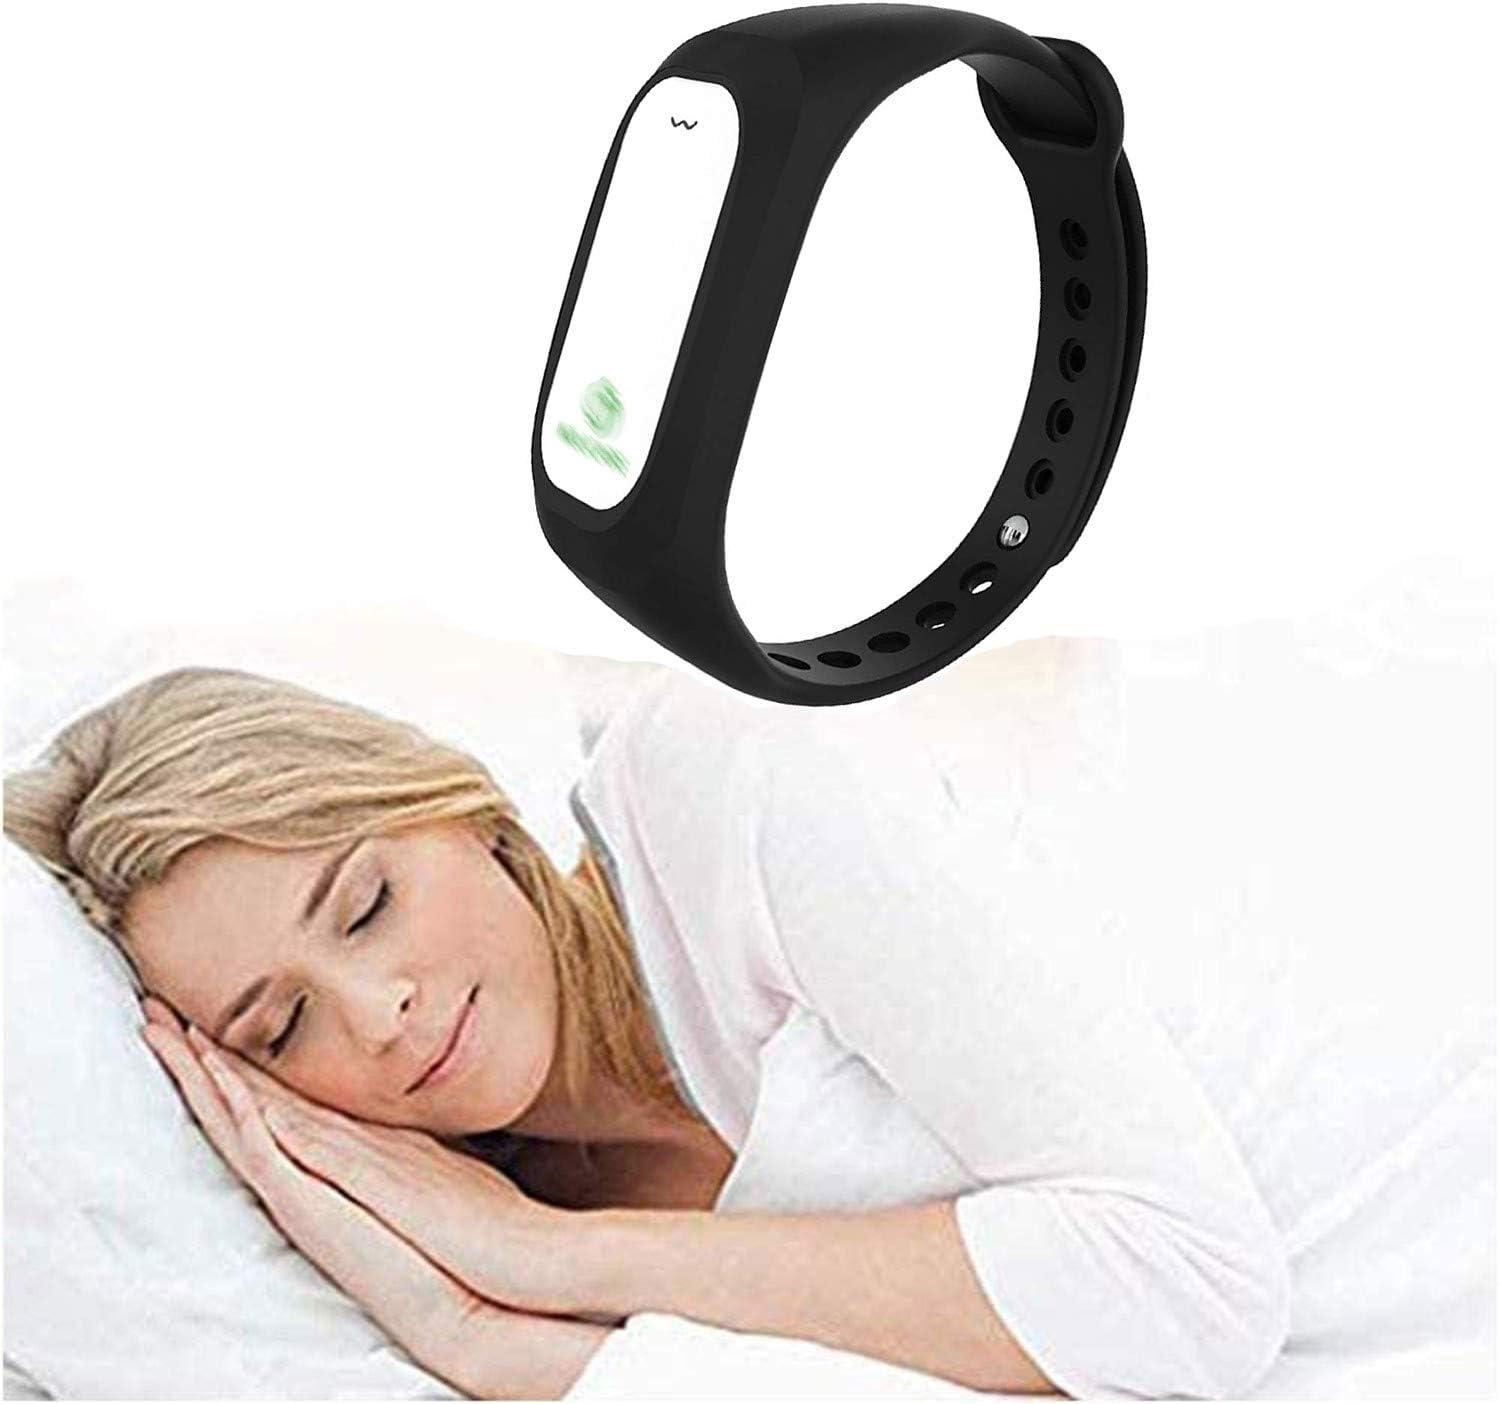 FGHHM Smart Anti-Snoring Omaha Mall Device Anti Ai Band Wrist Snoring Clearance SALE! Limited time! Sleep